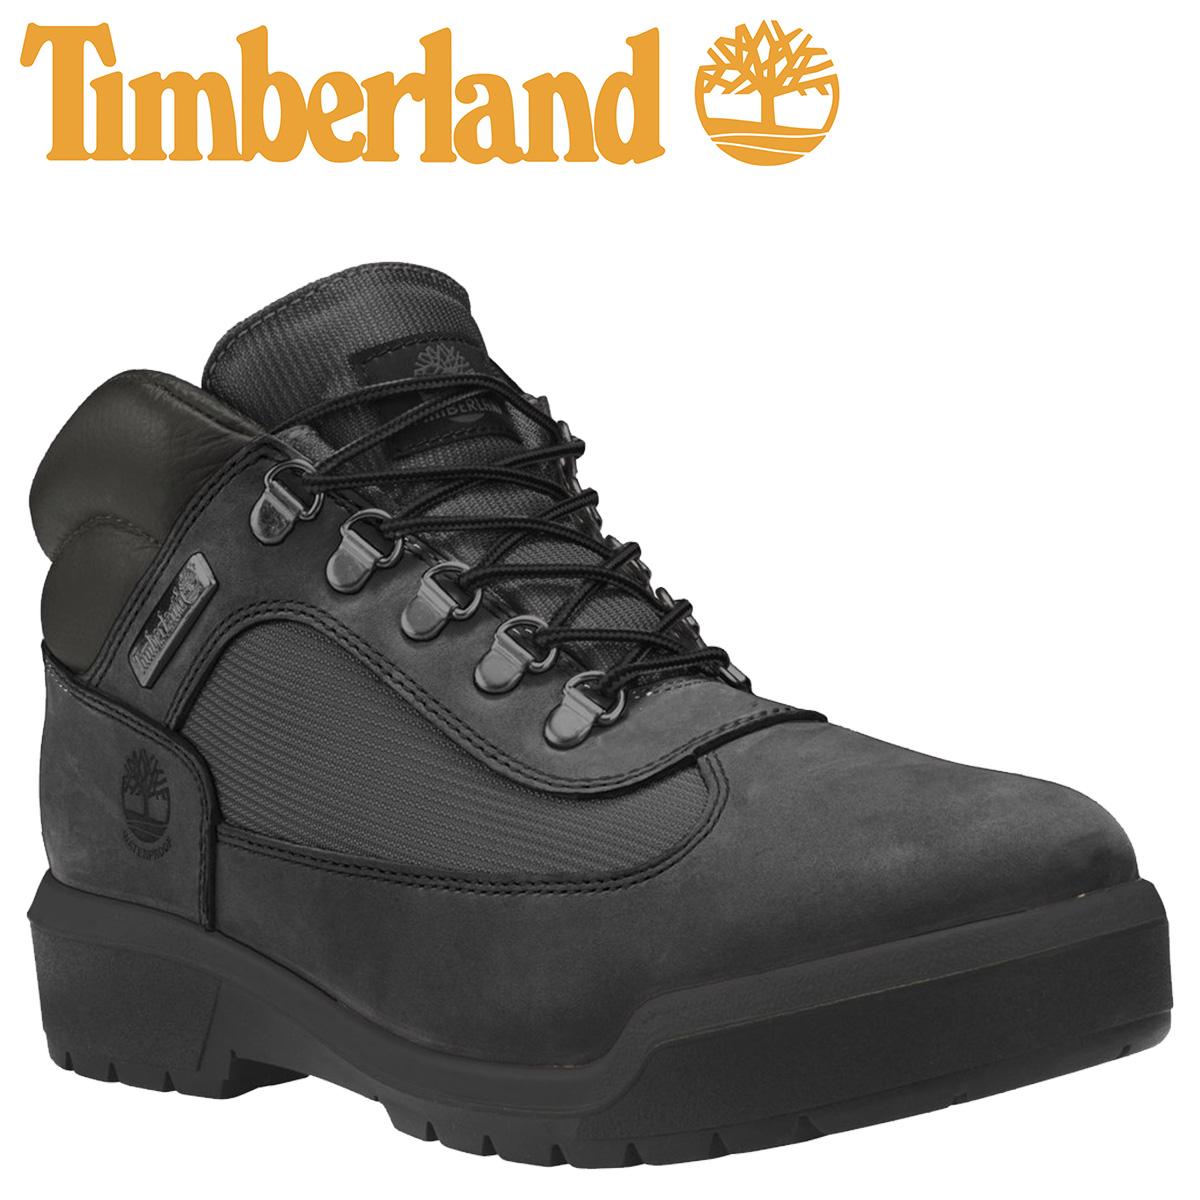 Timberland ブーツ メンズ ティンバーランド WATERPROOF FIELD BOOTS F/L A1A12 Dワイズ ブラック [予約商品 10/23頃入荷予定 新入荷]